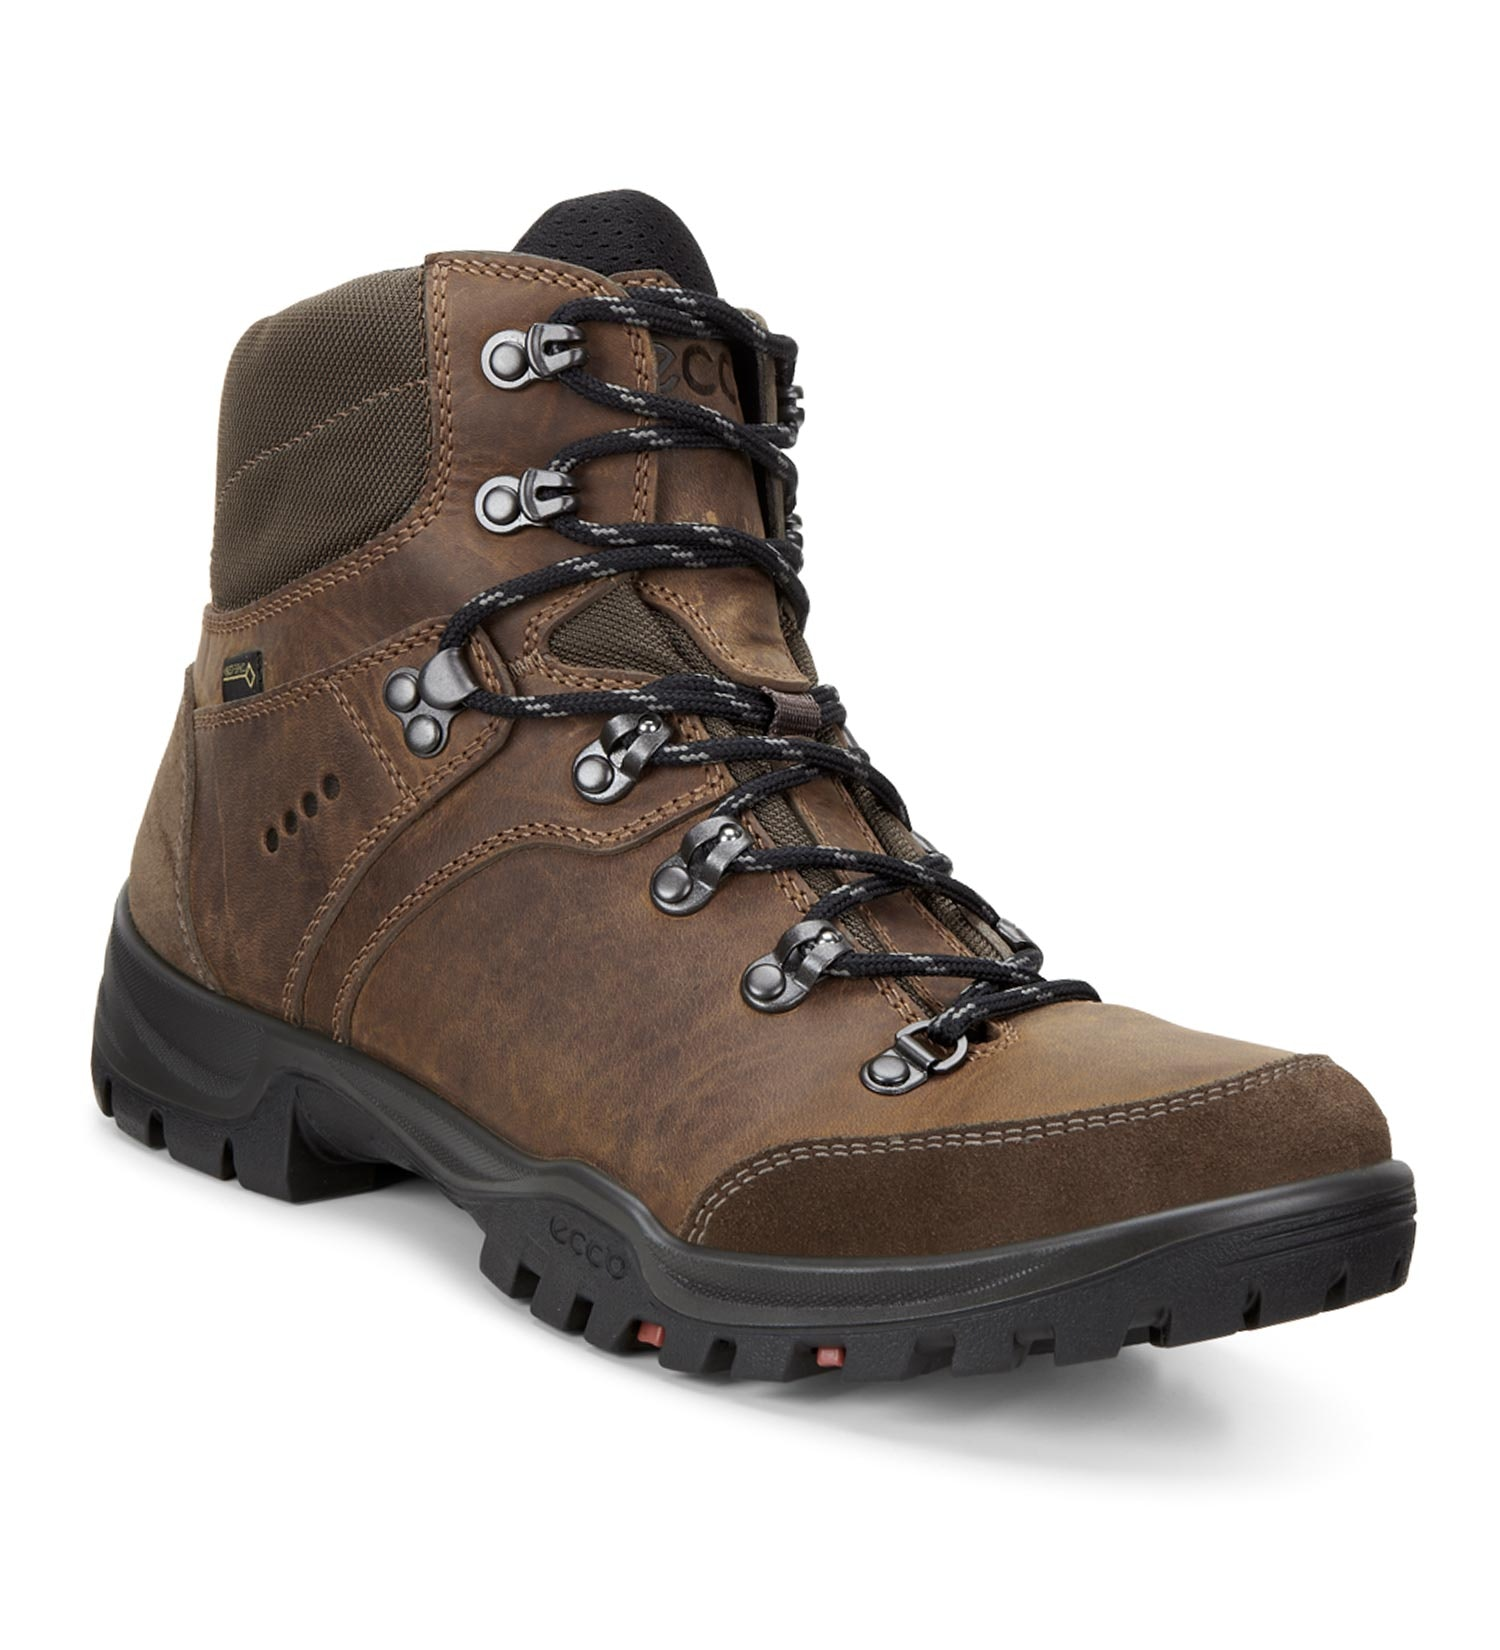 ECCO Mens Xpedition Iii Gore-tex Mid Cut Hiking Boot